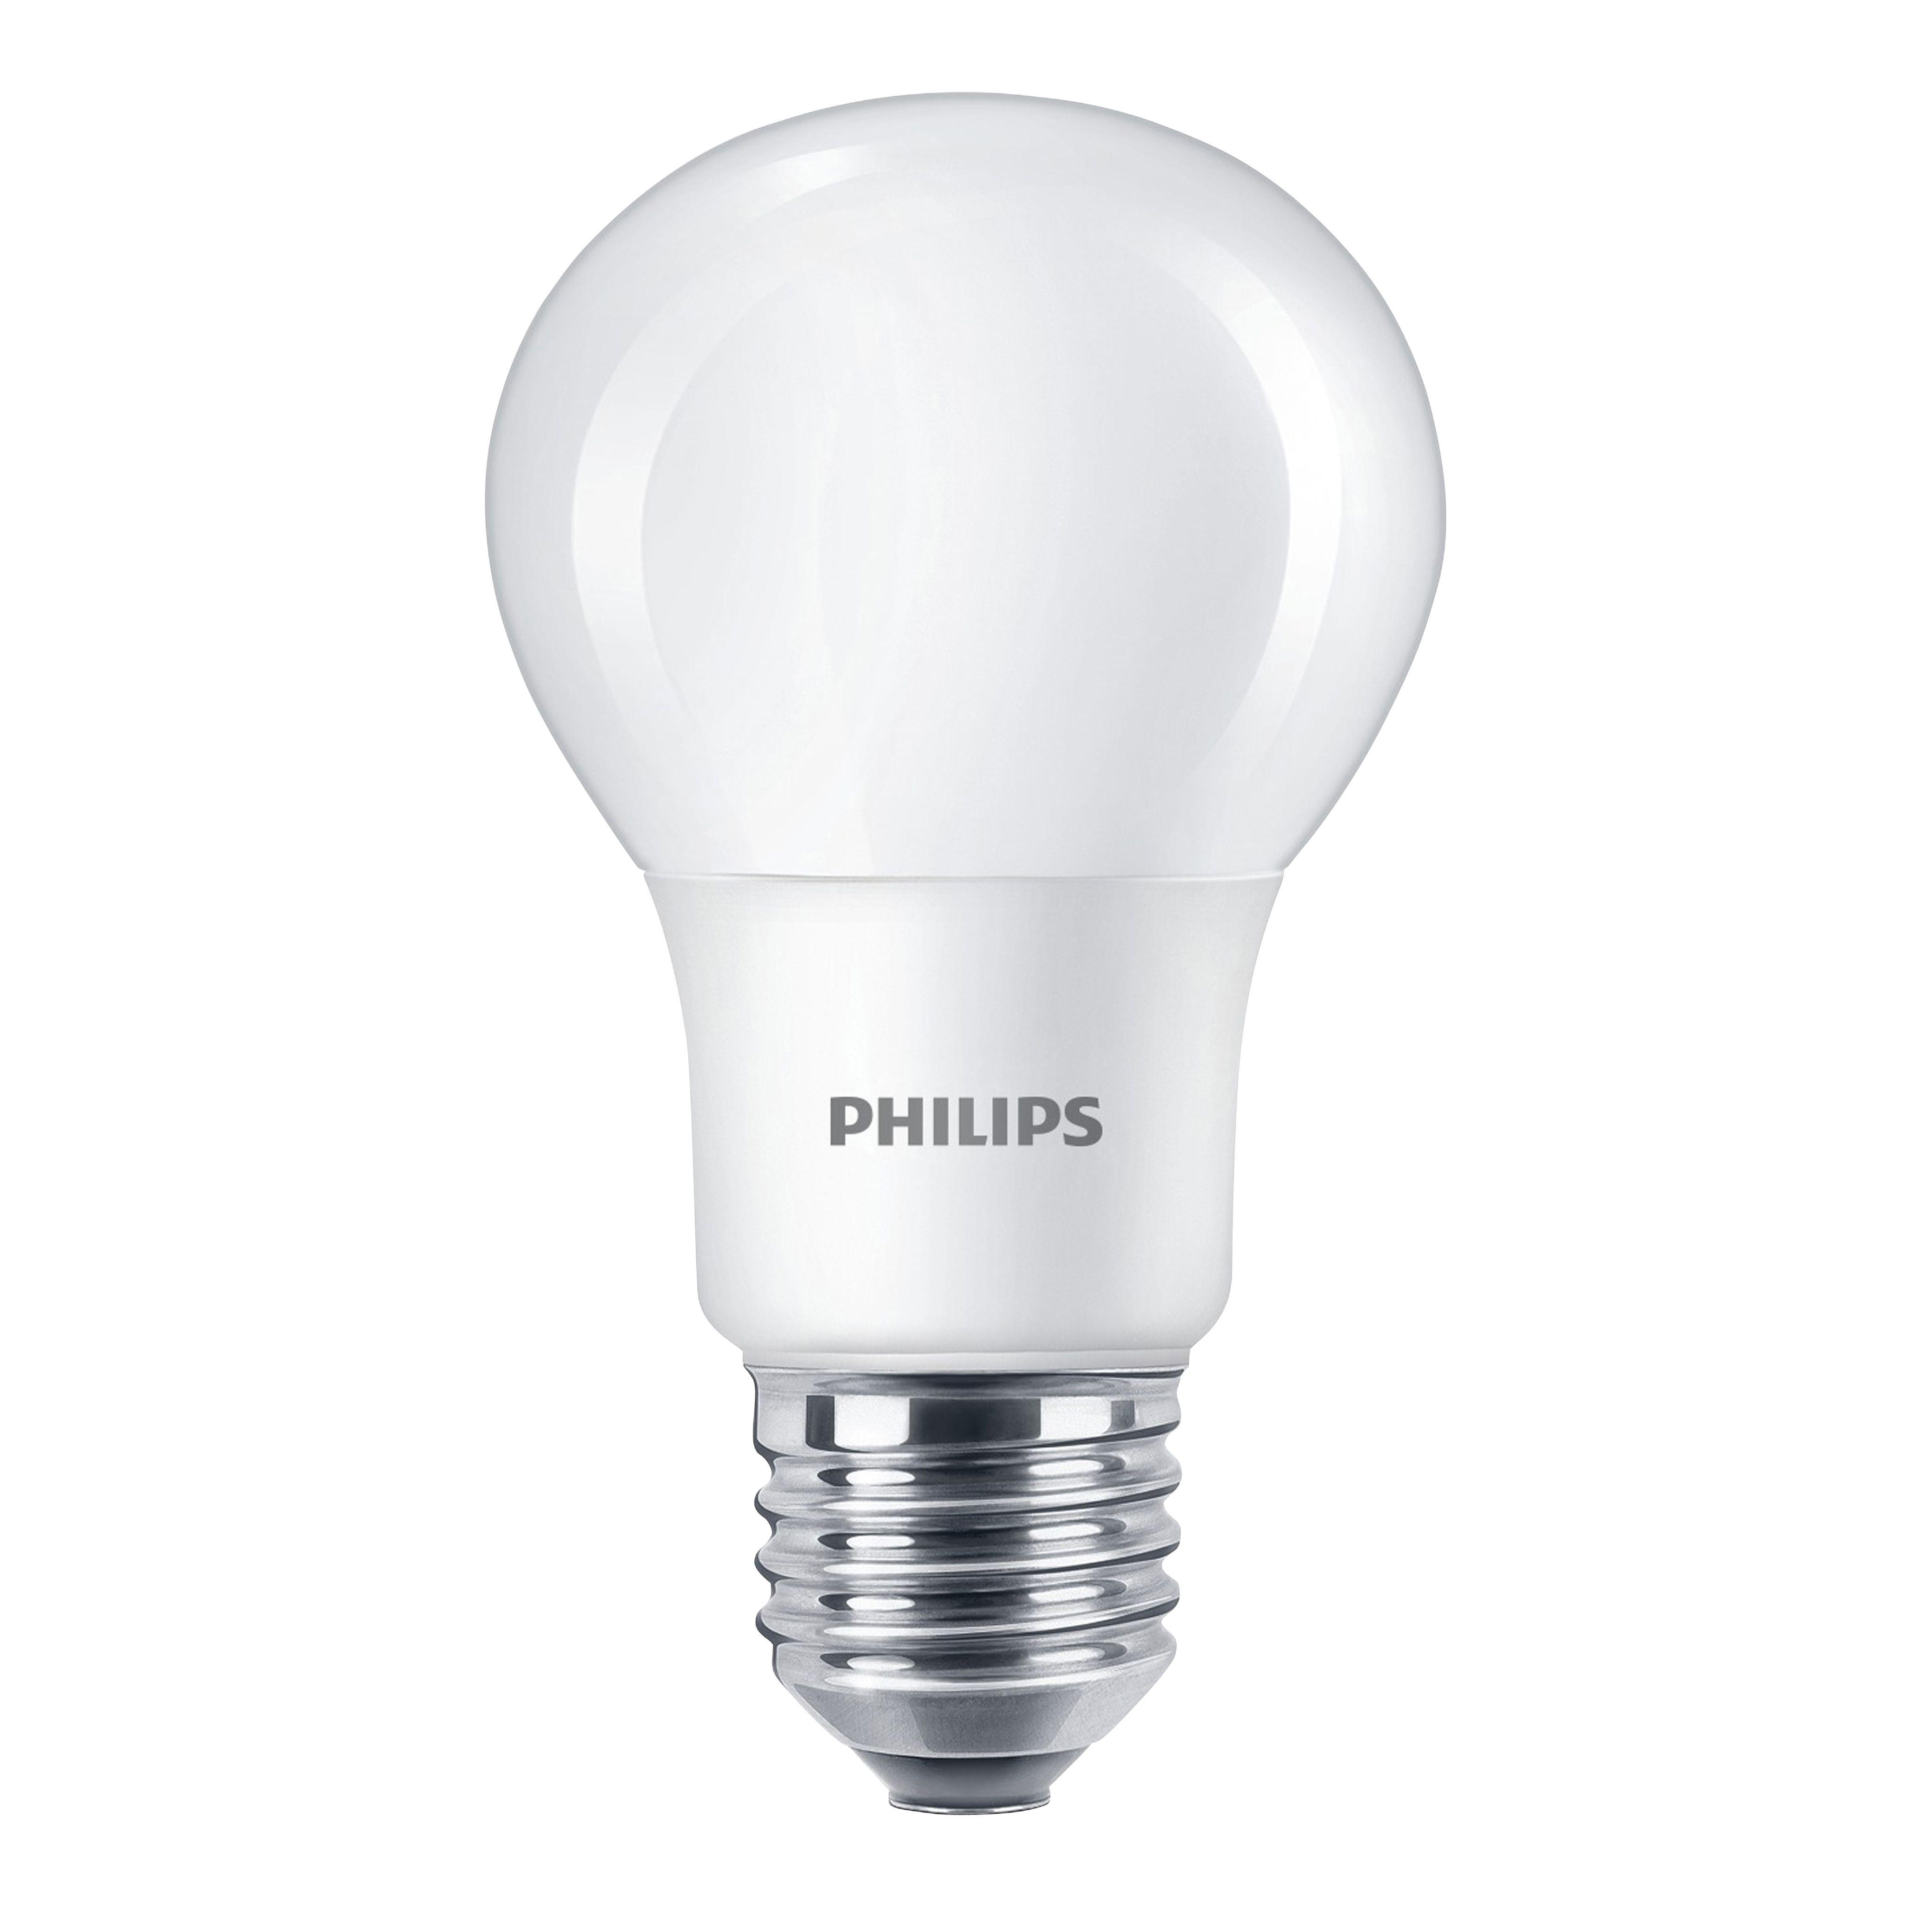 Philips E27 806lm Led Classic Light Bulb